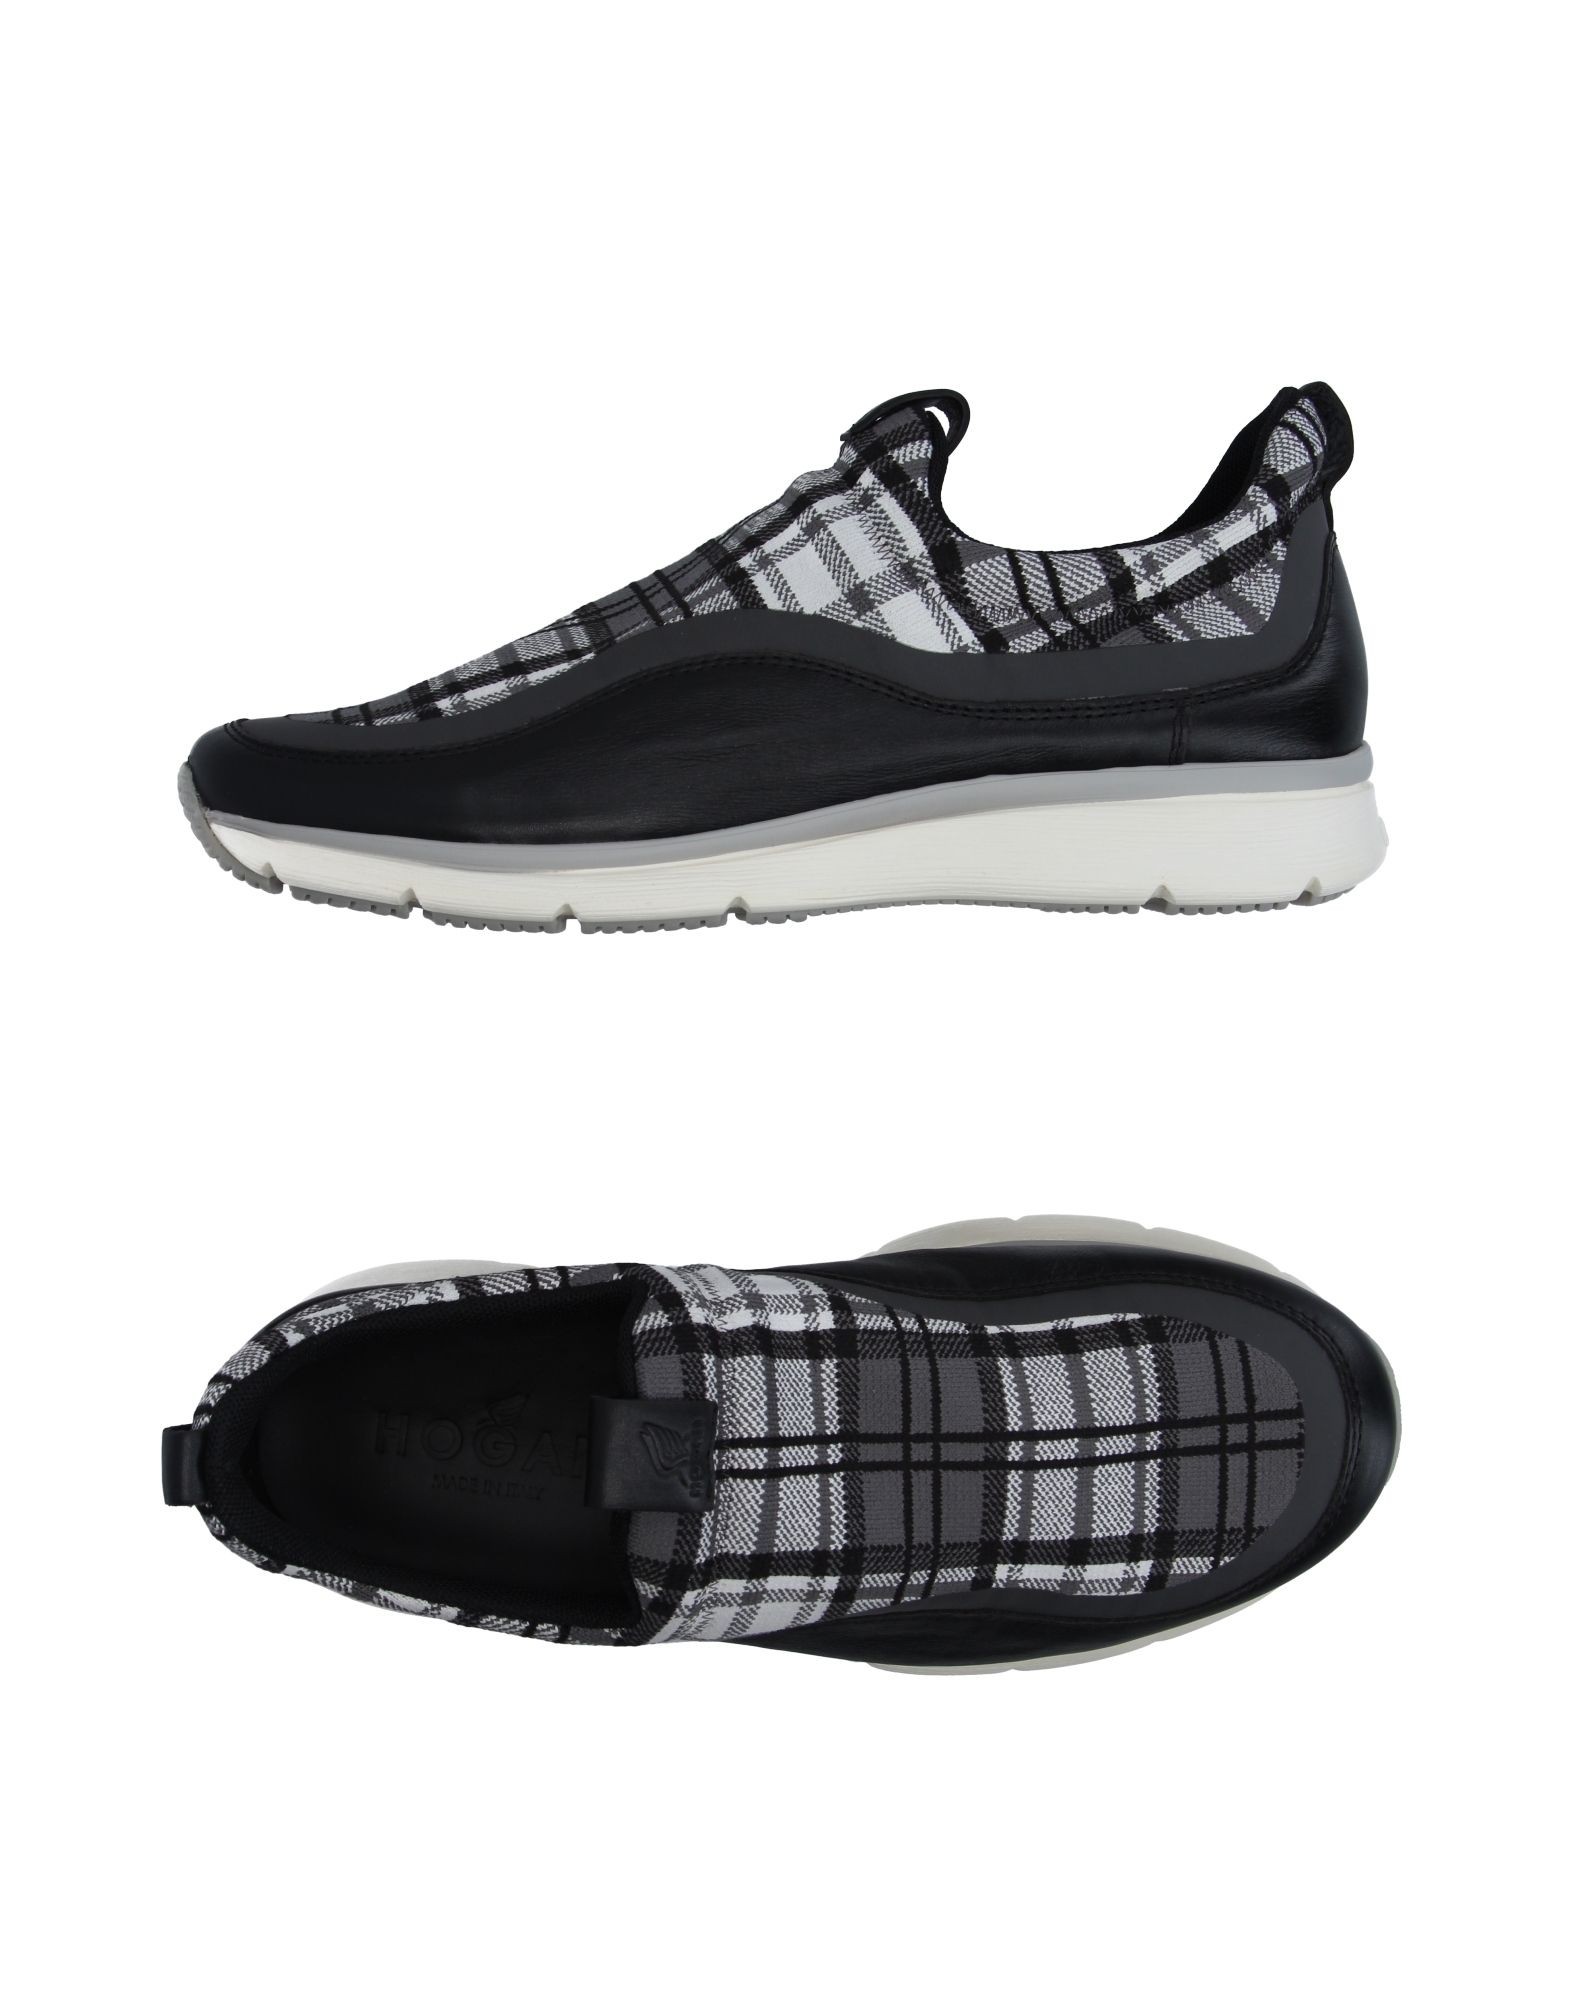 Moda Sneakers Hogan 11175329BC Uomo - 11175329BC Hogan 26a0d3